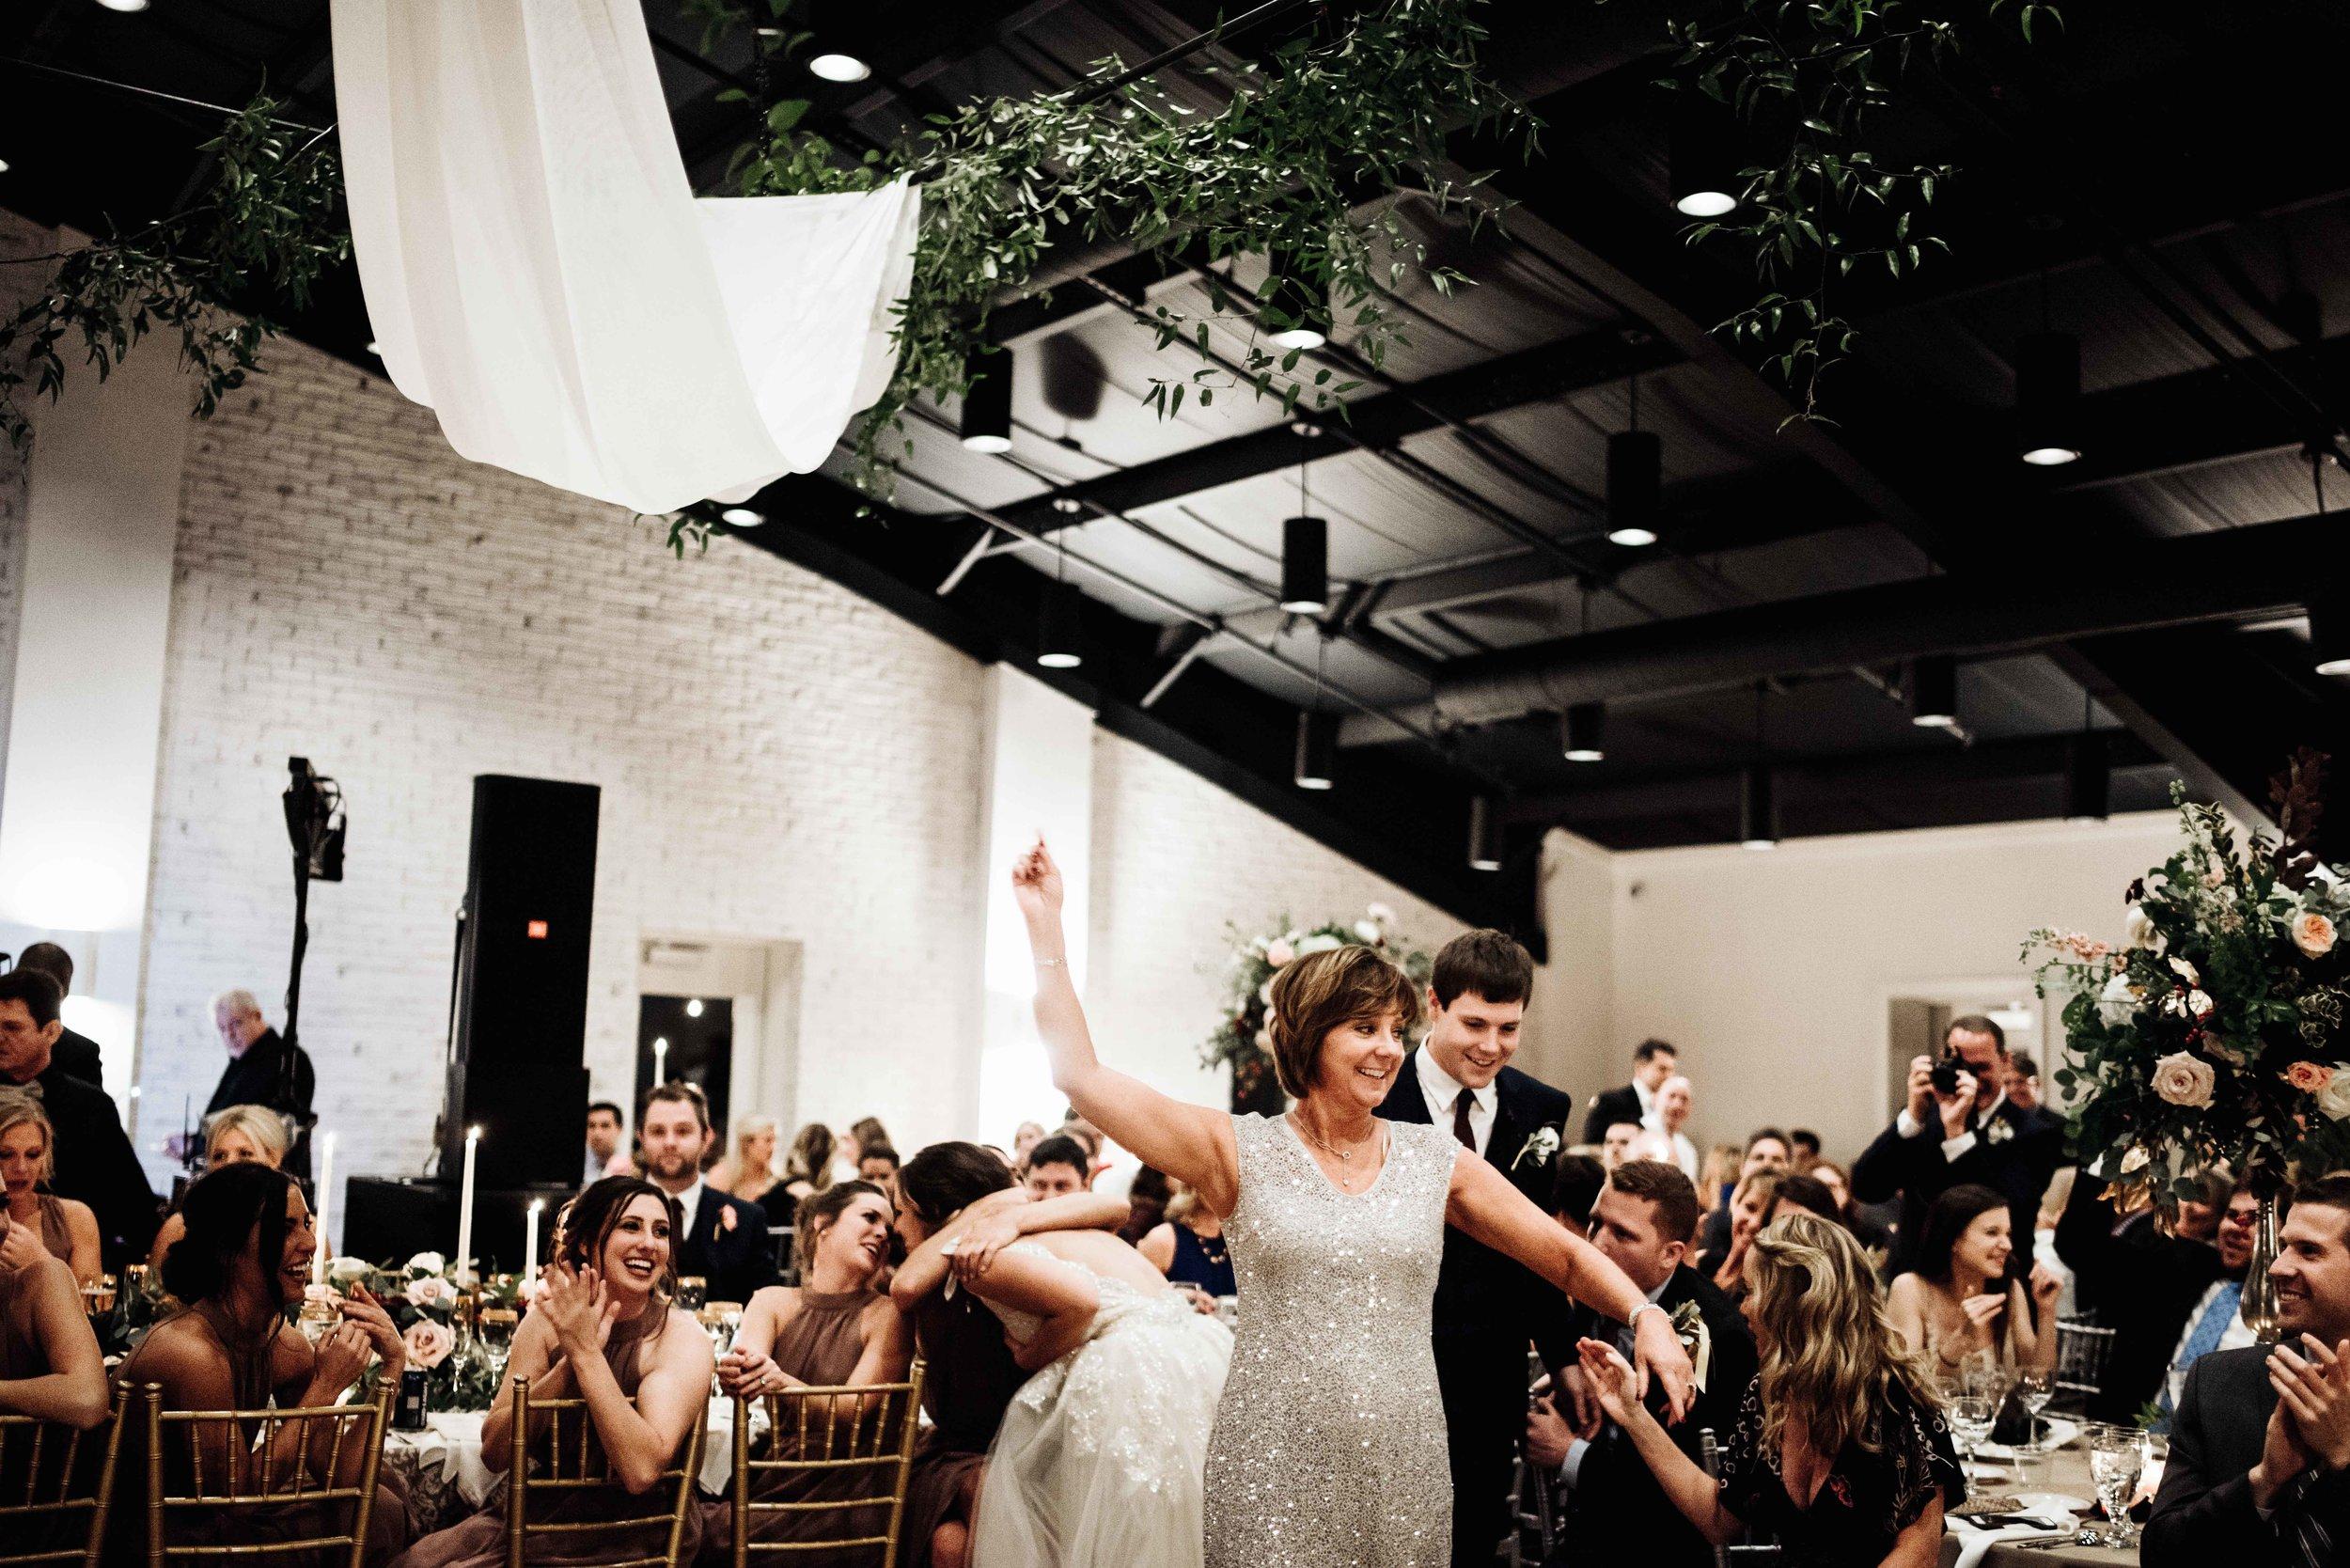 Carlee-Bob-Indianapolis-Wedding-Blog-96.jpg